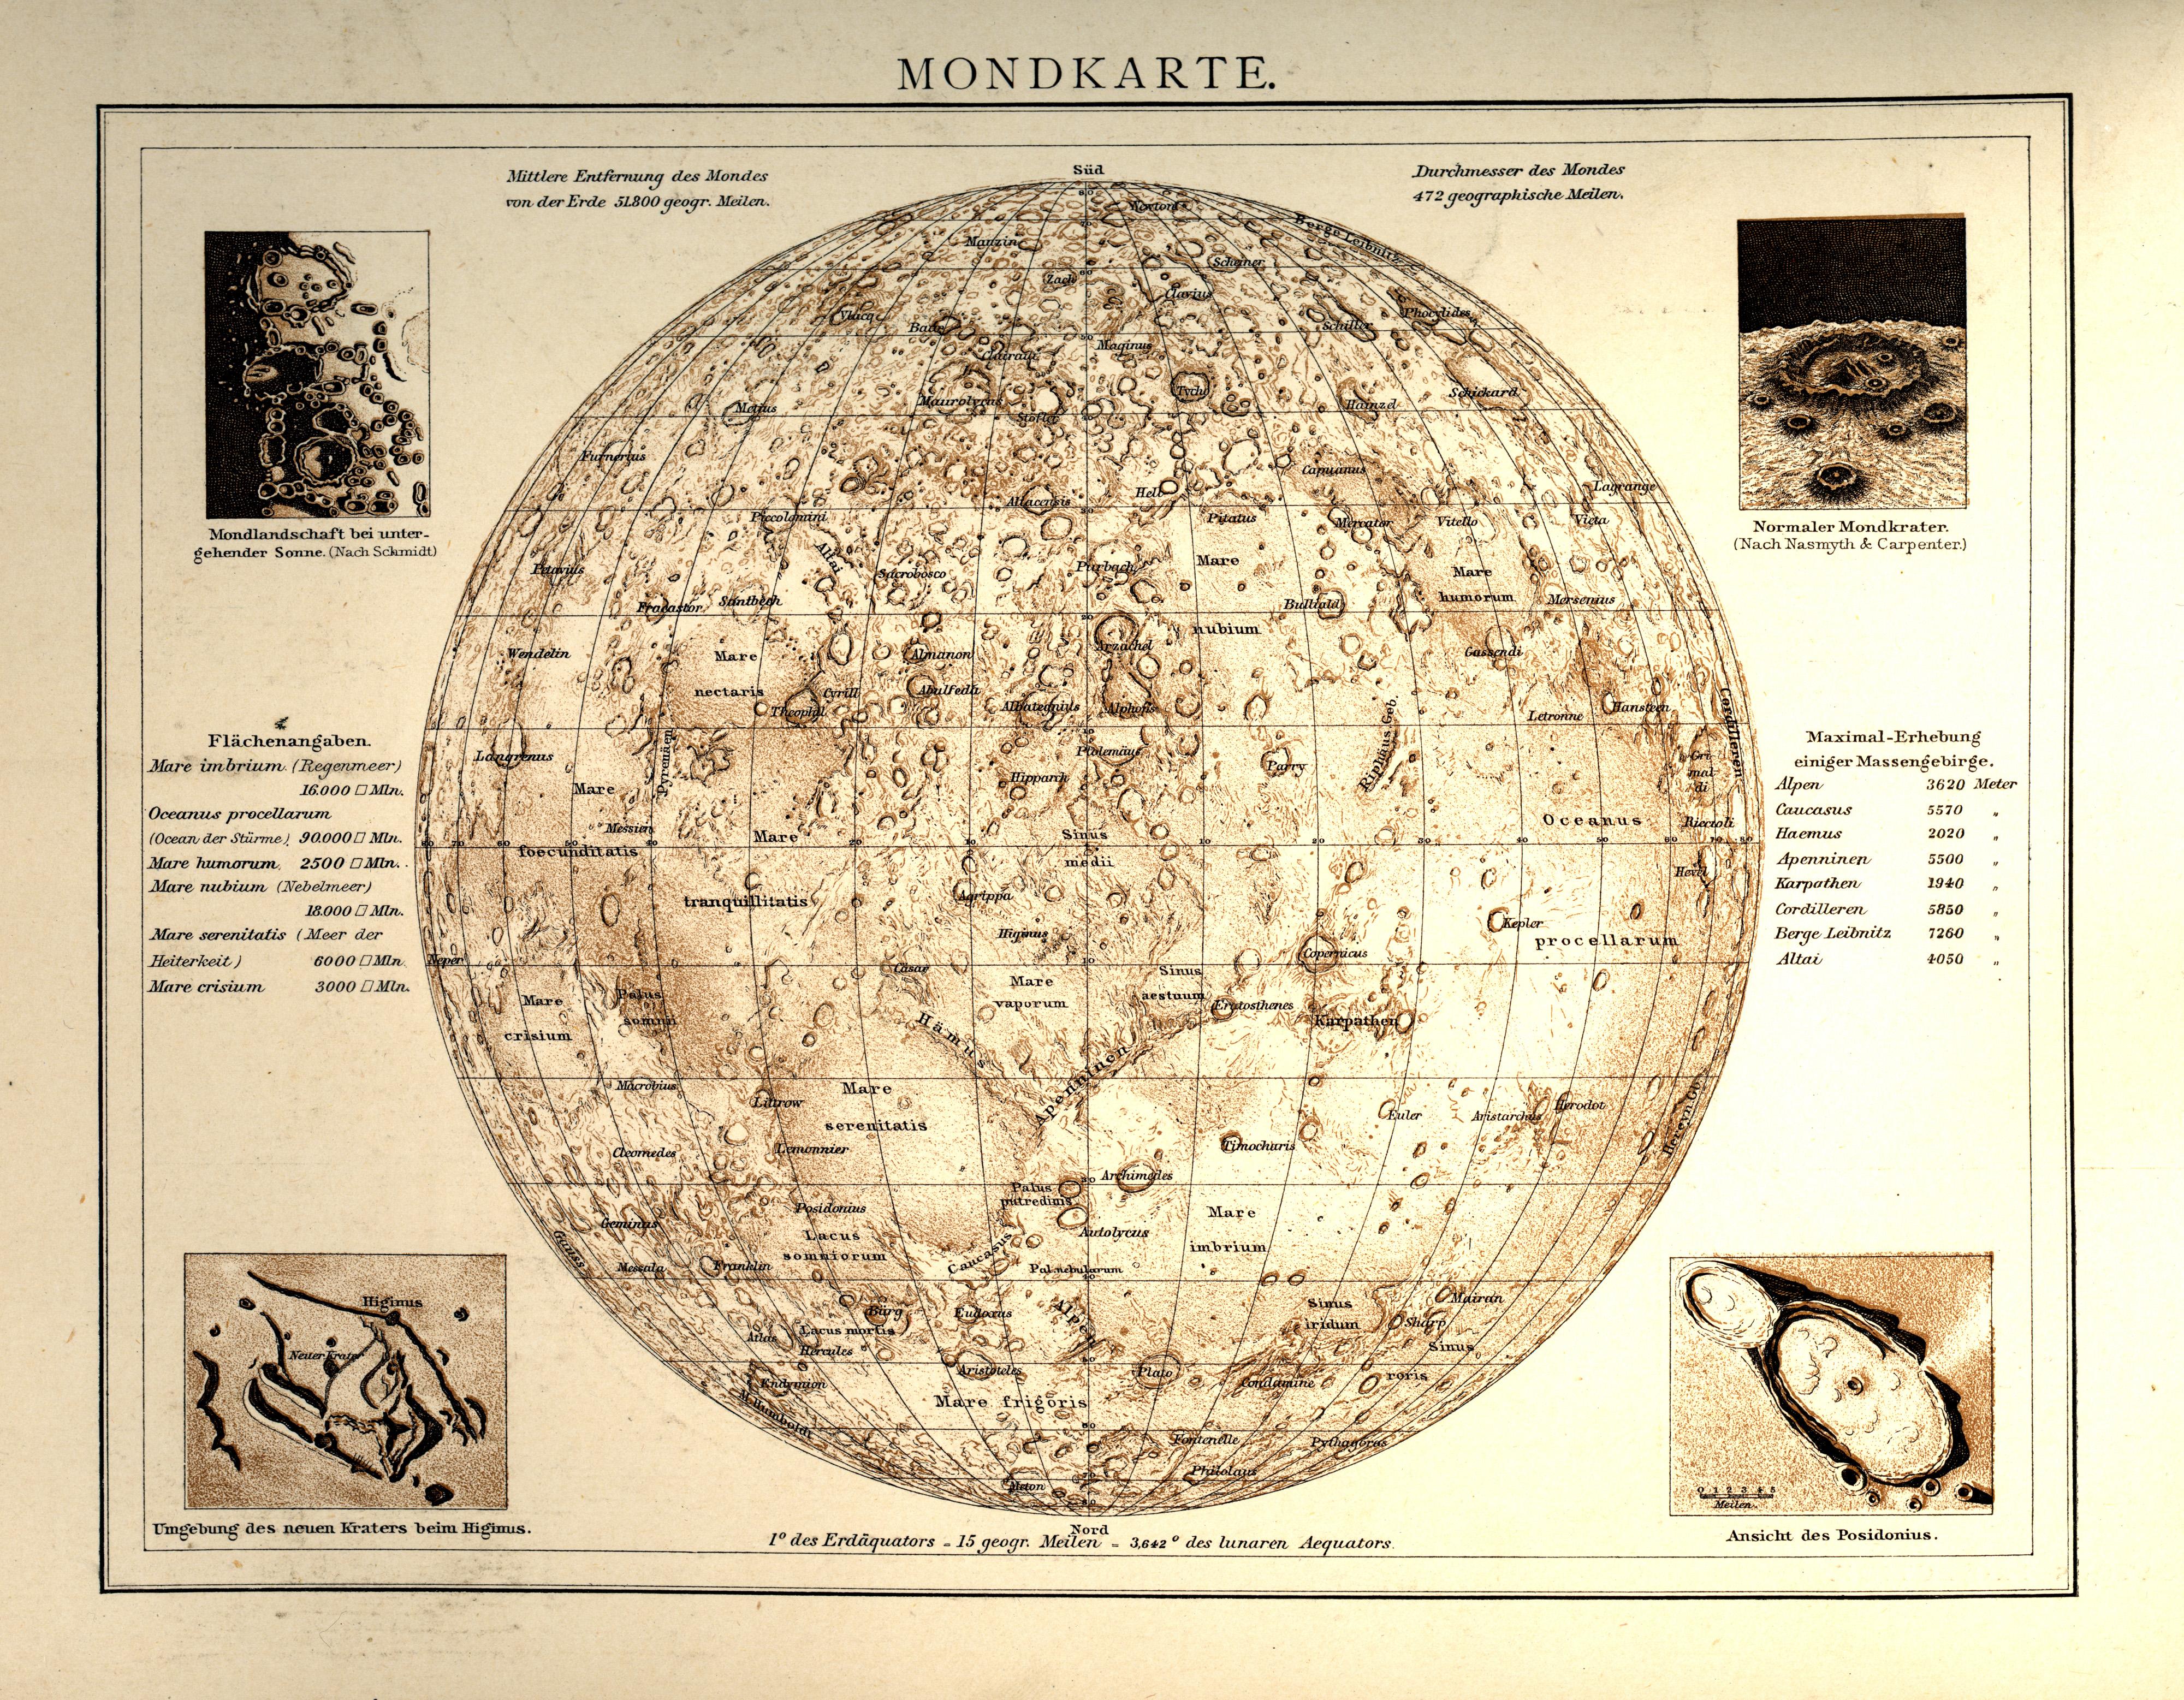 Andrees Allgemeiner Handatlas - Mondkarte (1881)